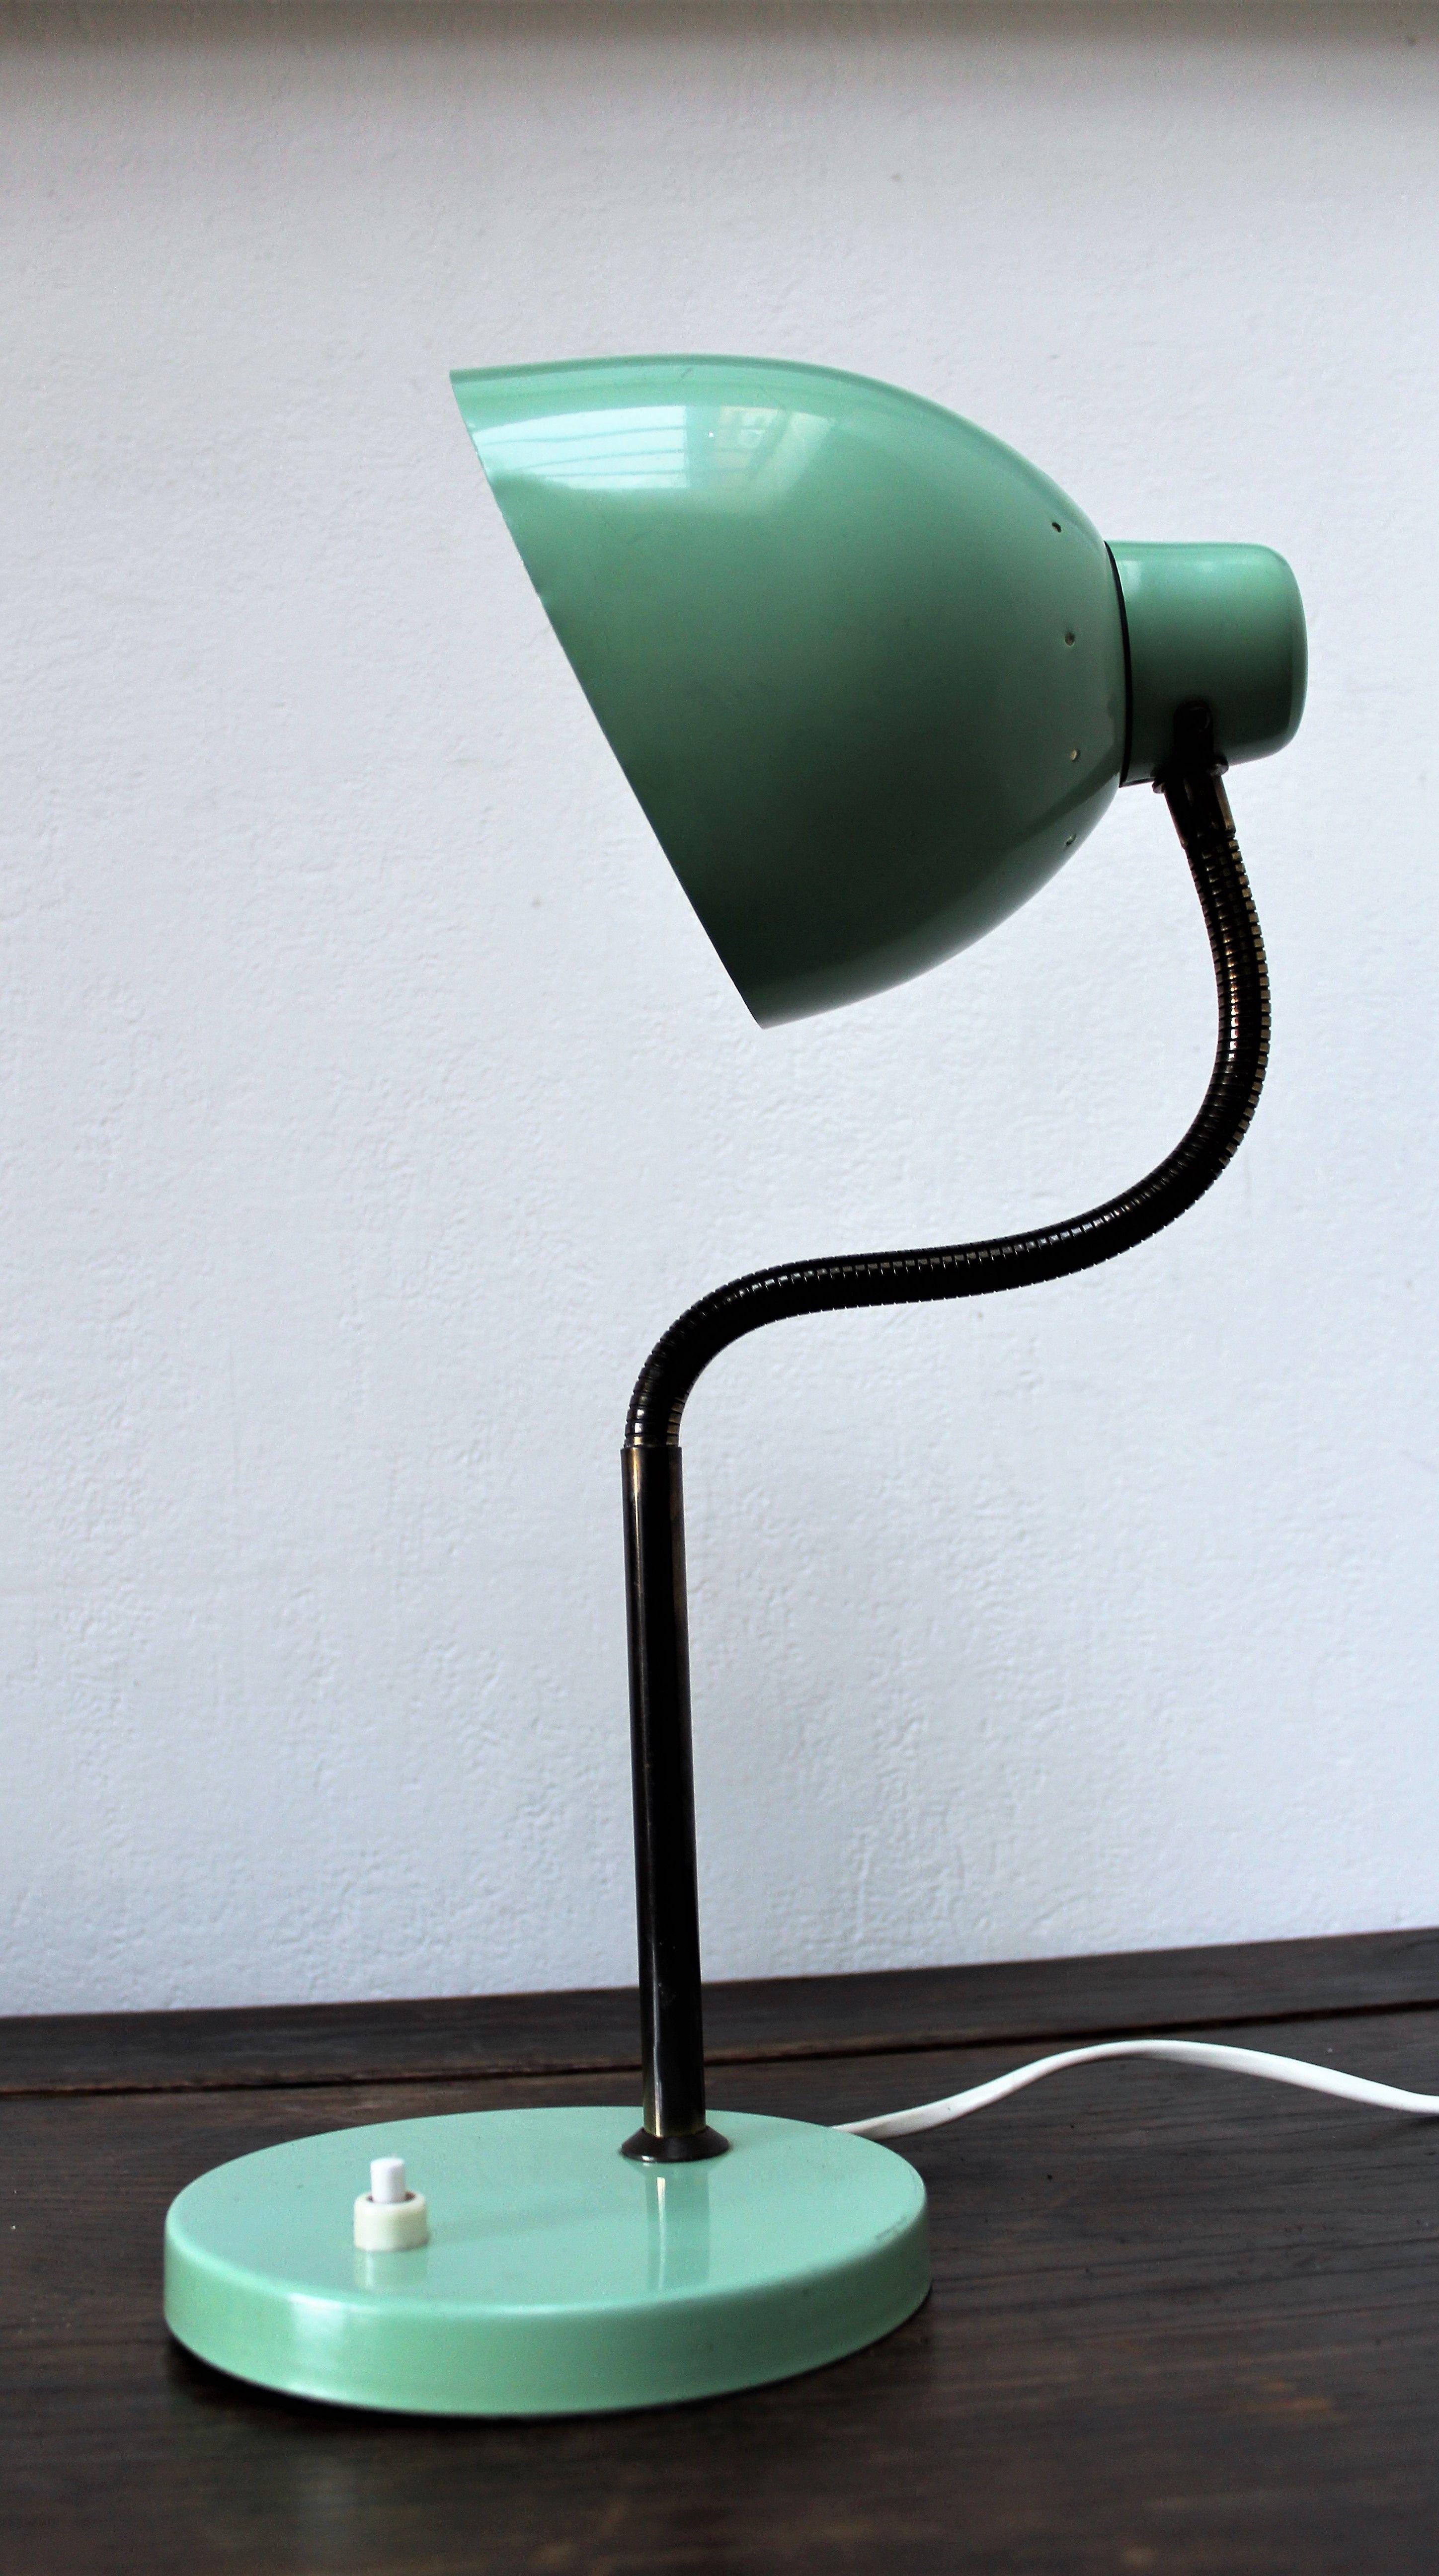 Retro Desk Lamp Table Lamp In Mint Green Industrial Metal Etsy Retro Desk Lamp Retro Lighting Table Lamp